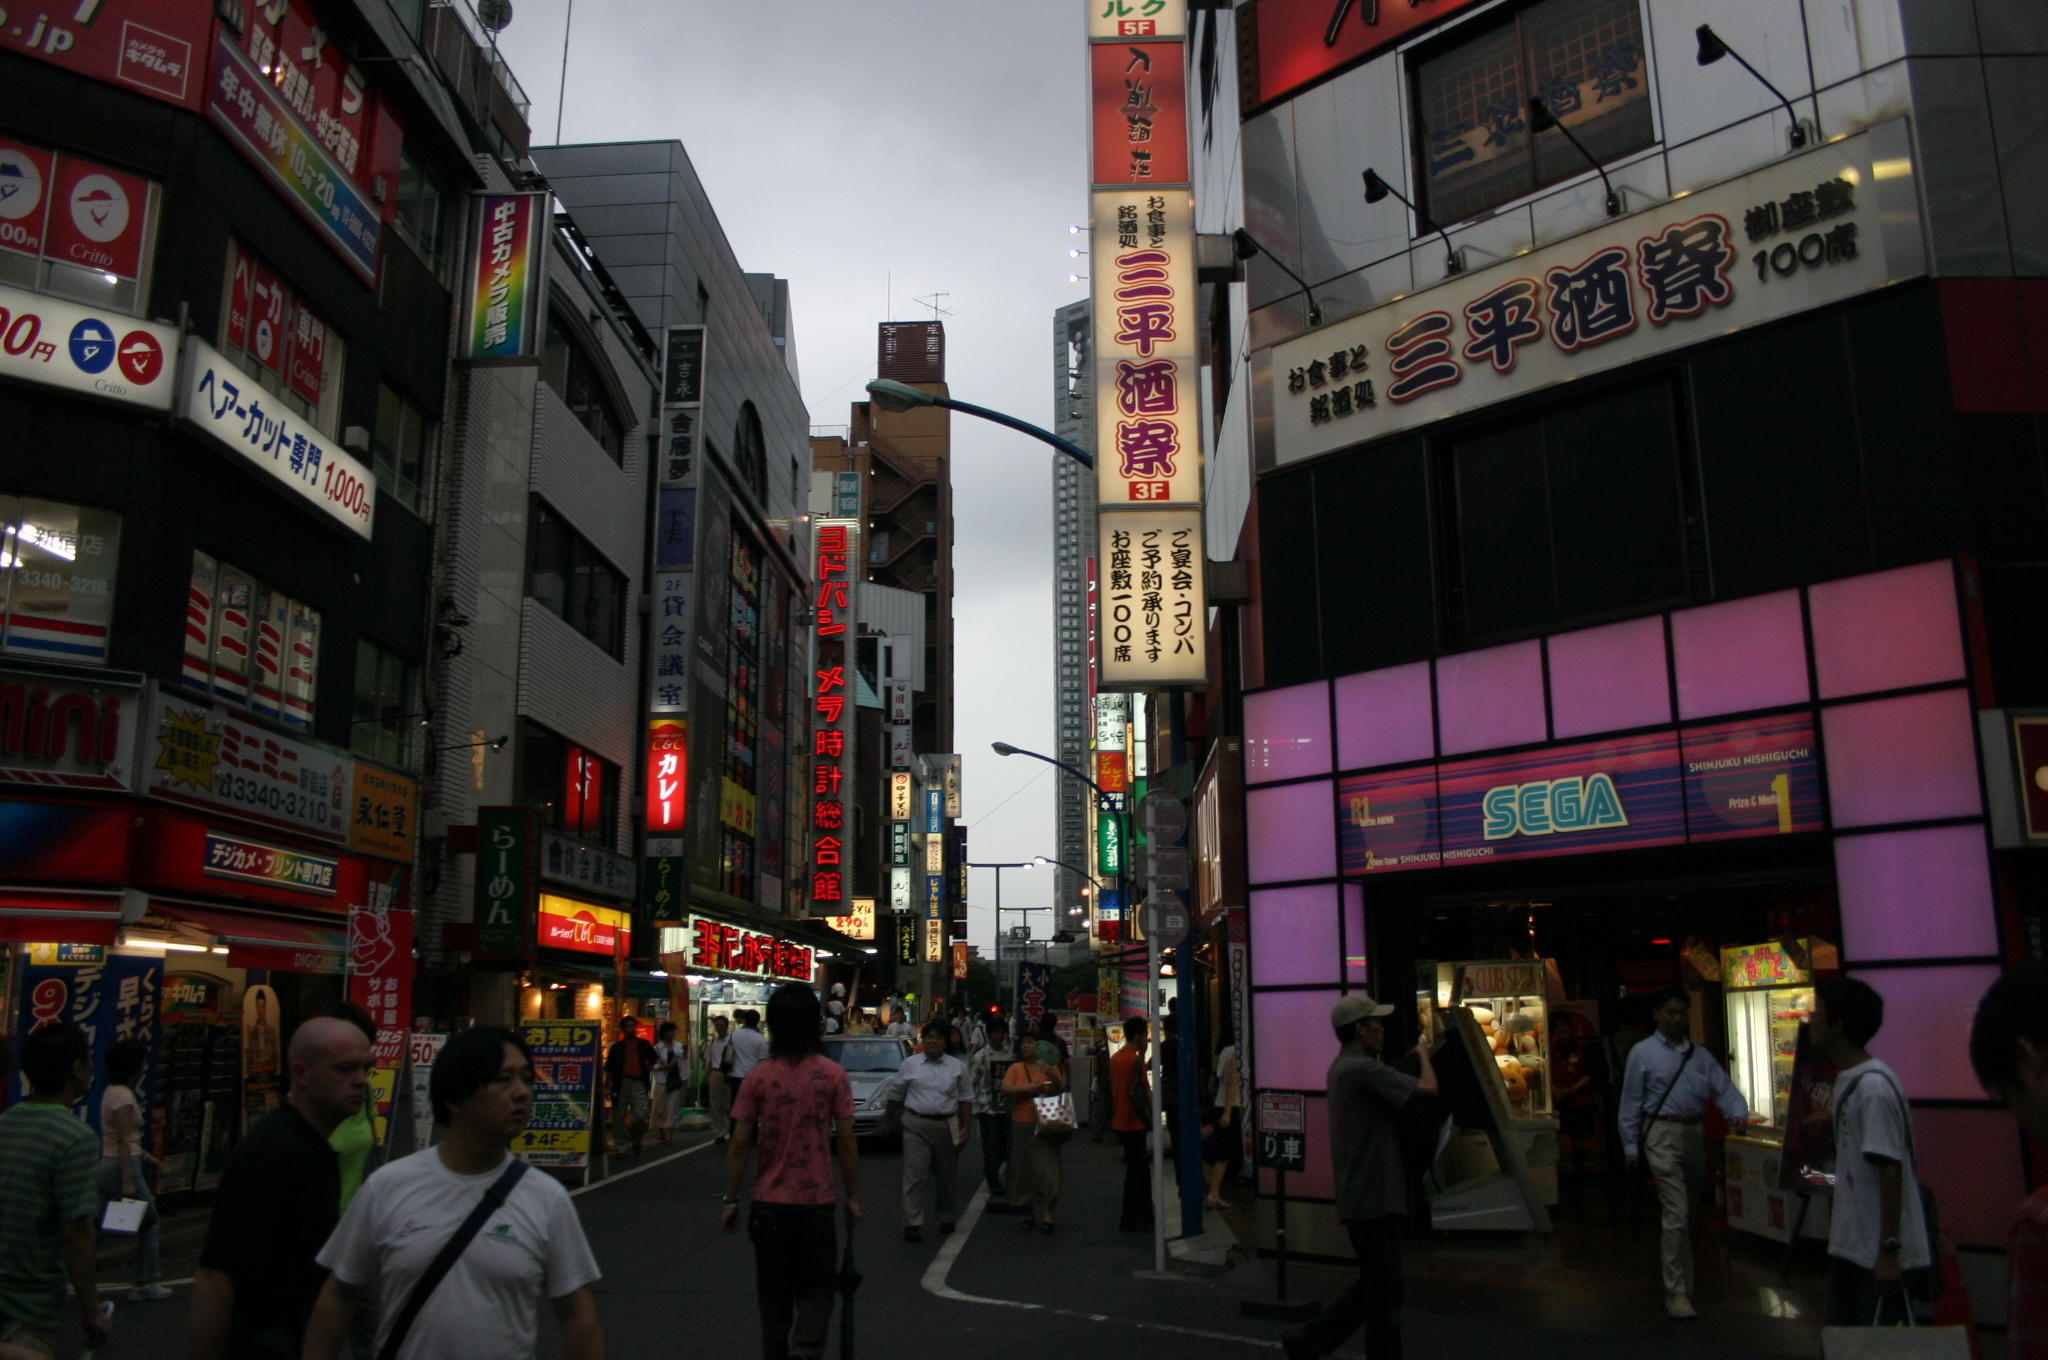 Tokyo by stevezpj